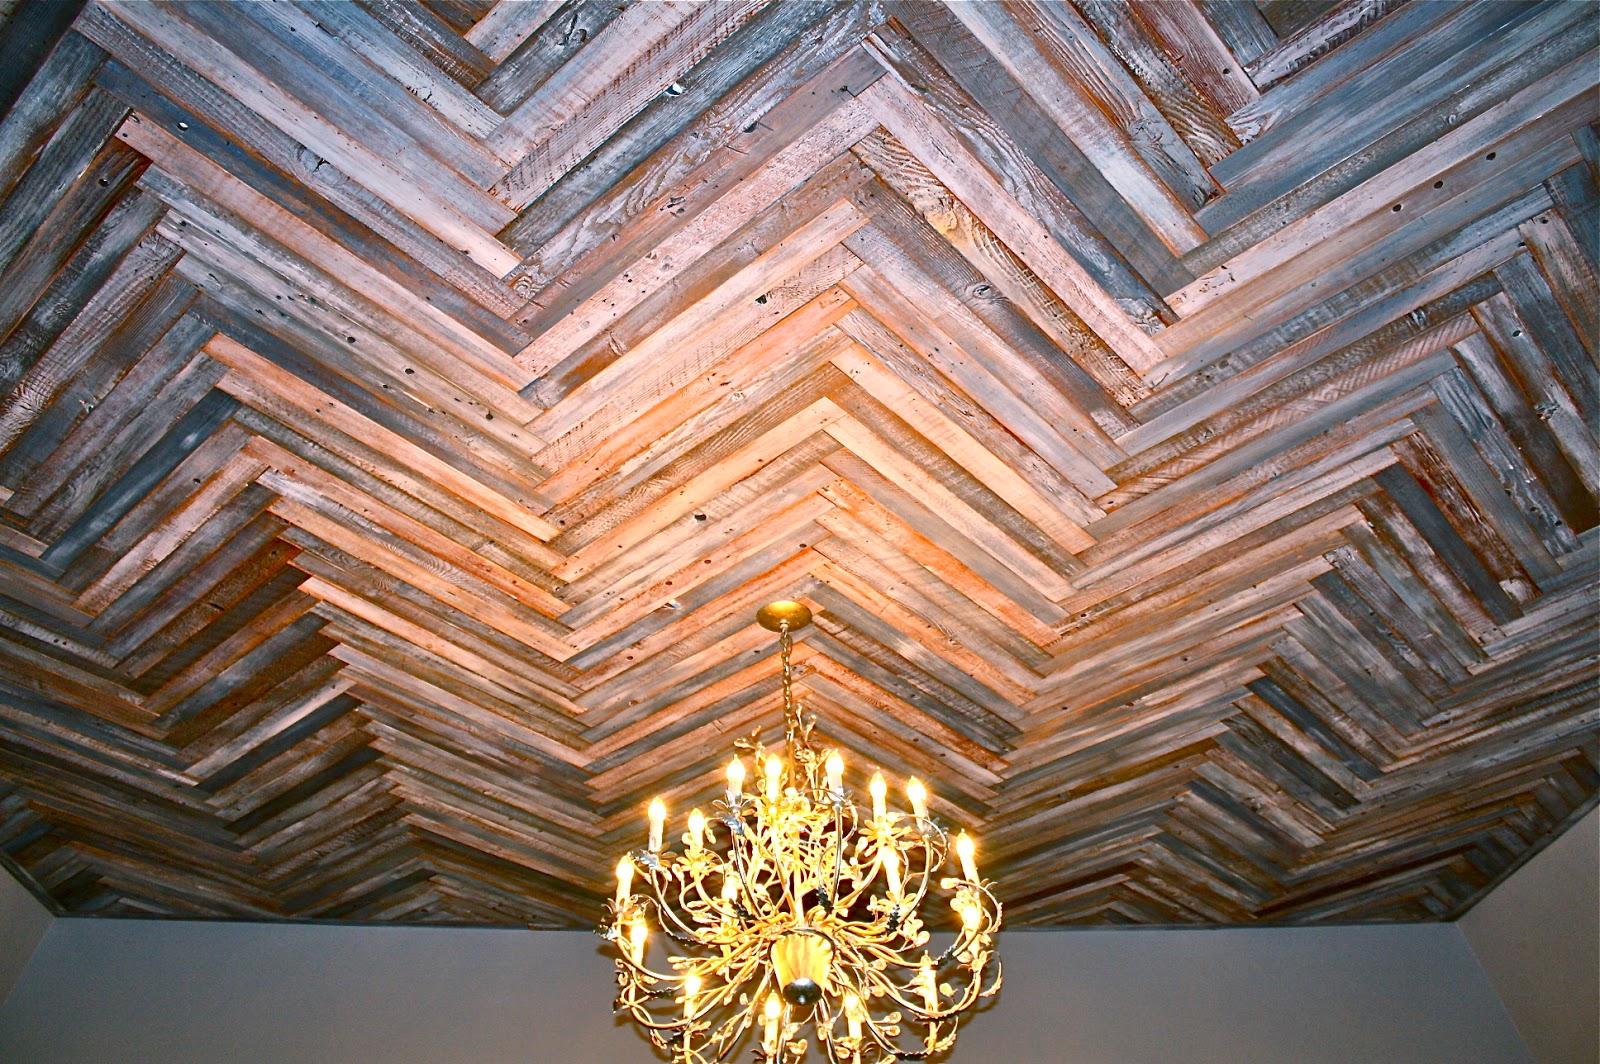 Makemeprettyagain reclaimed wood herringbone pattern for Riciclo bancali legno